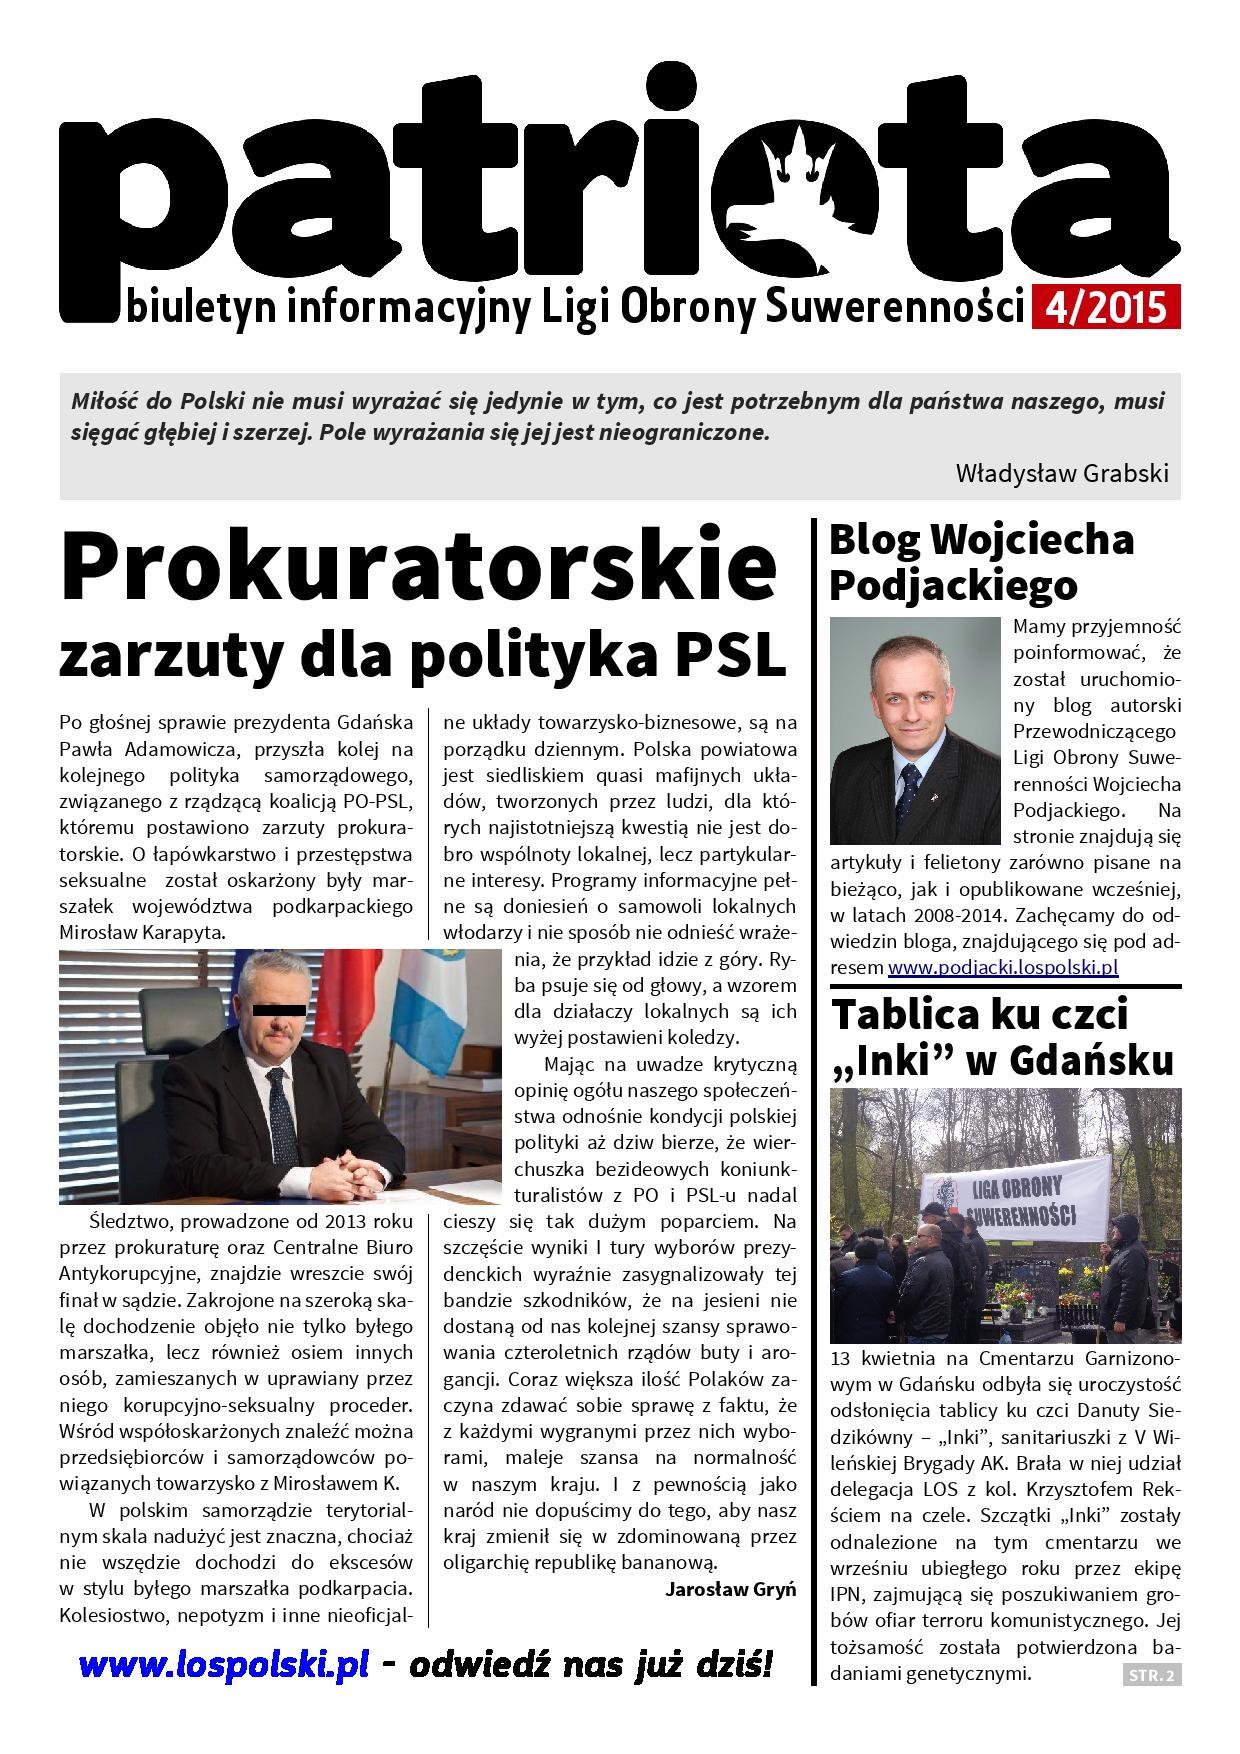 Patriota 4/2015